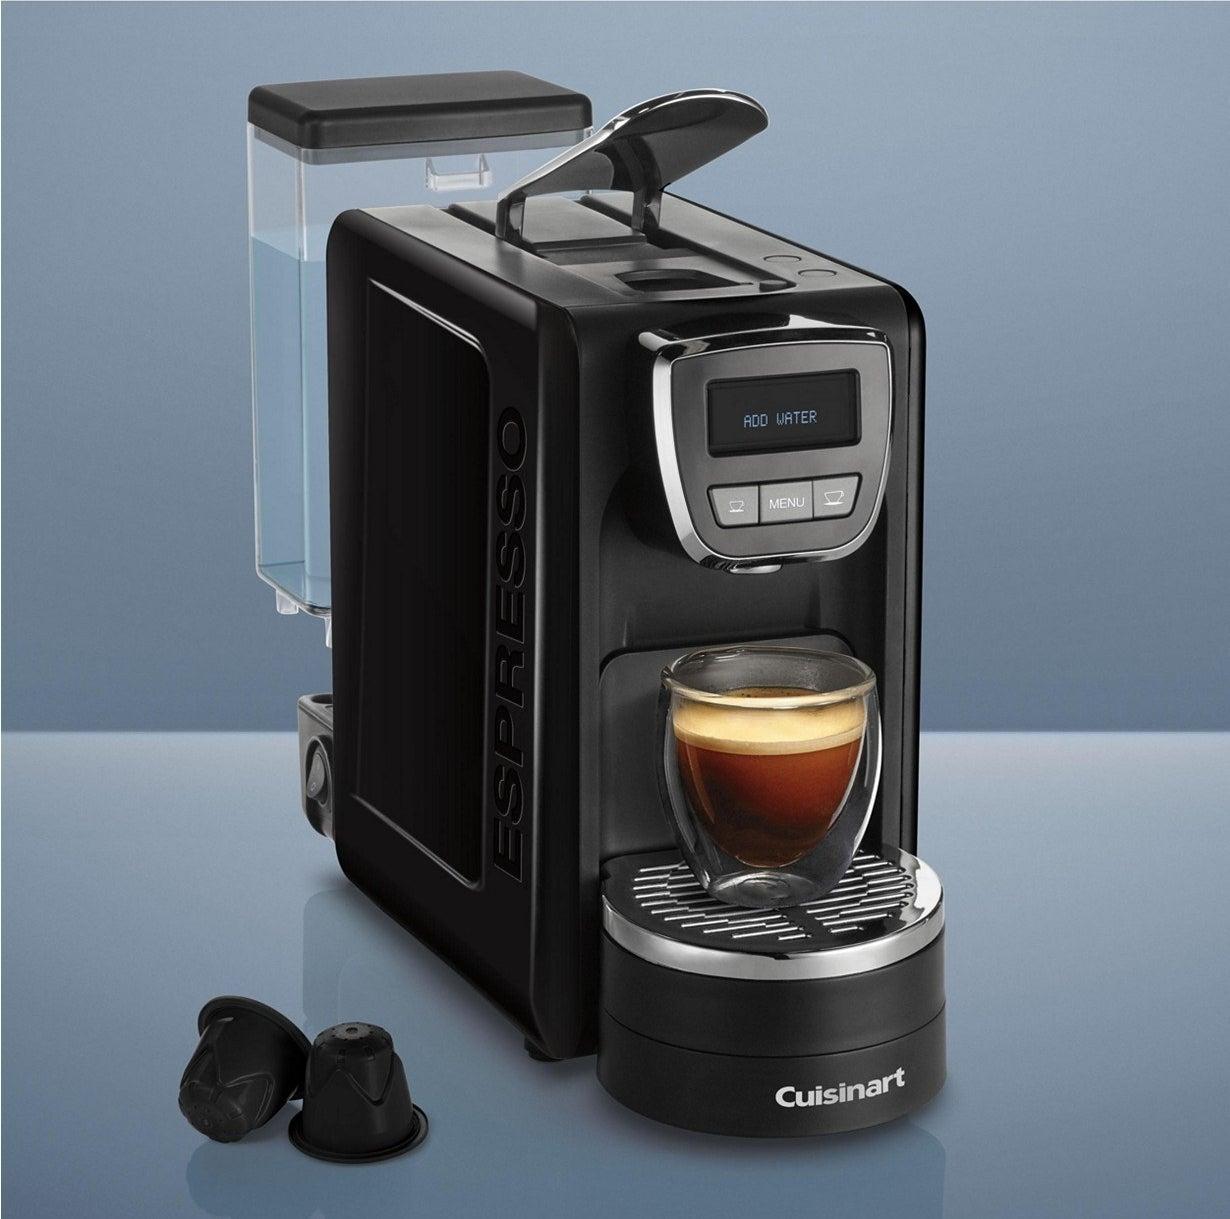 The Cuisinart EM-25 Espresso Defined™ machine